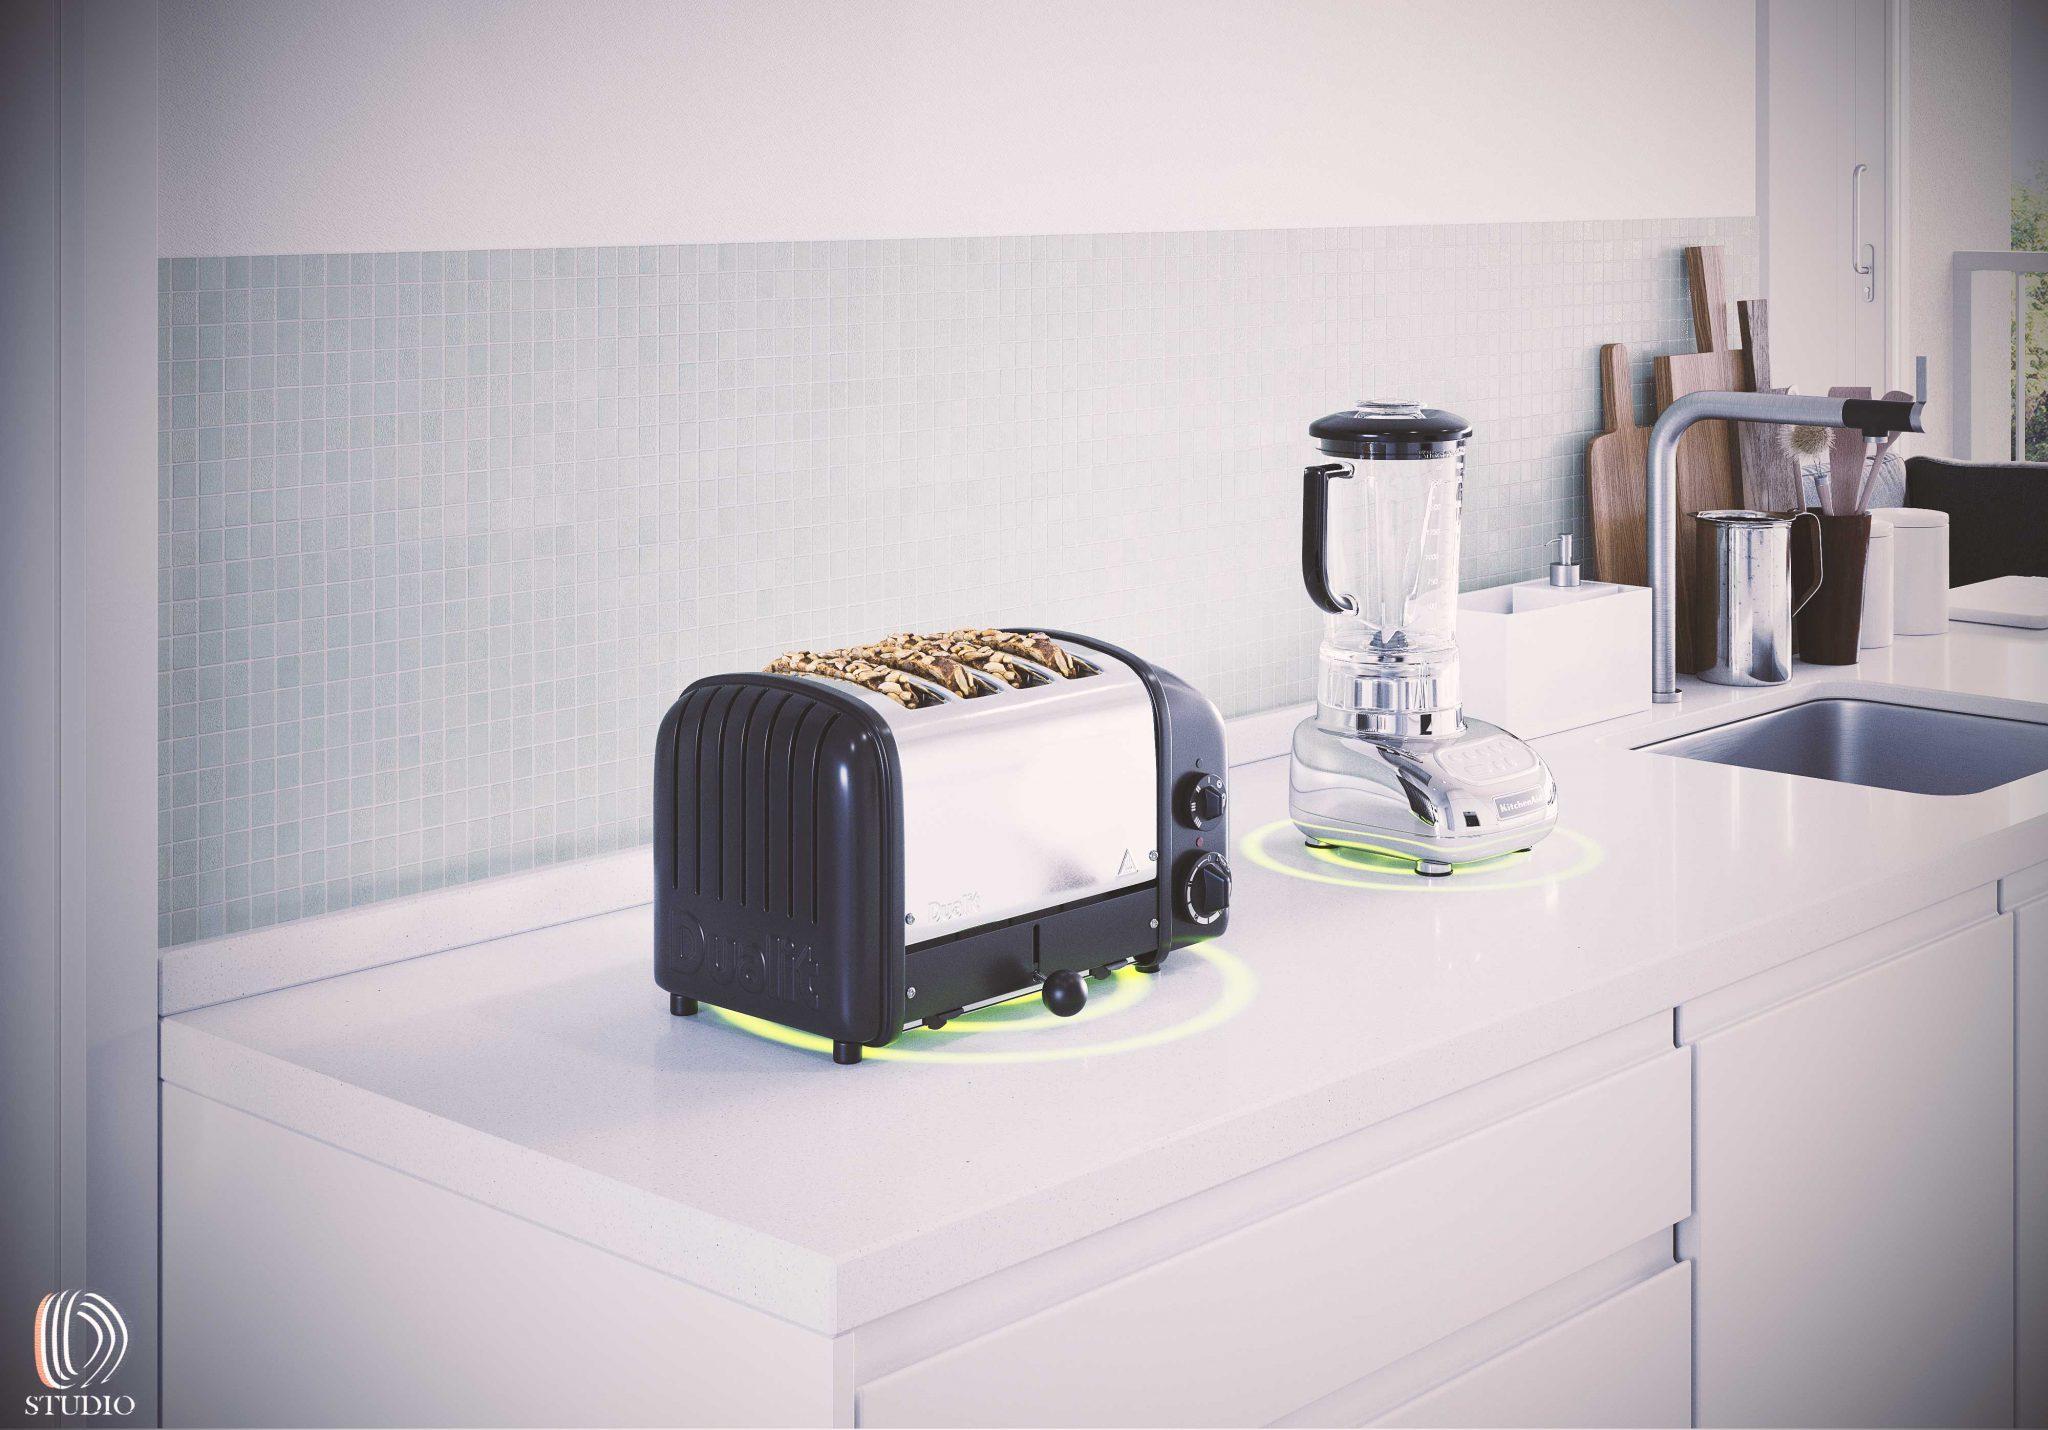 00-20-01-Smart-Kitchen-Technology-View2